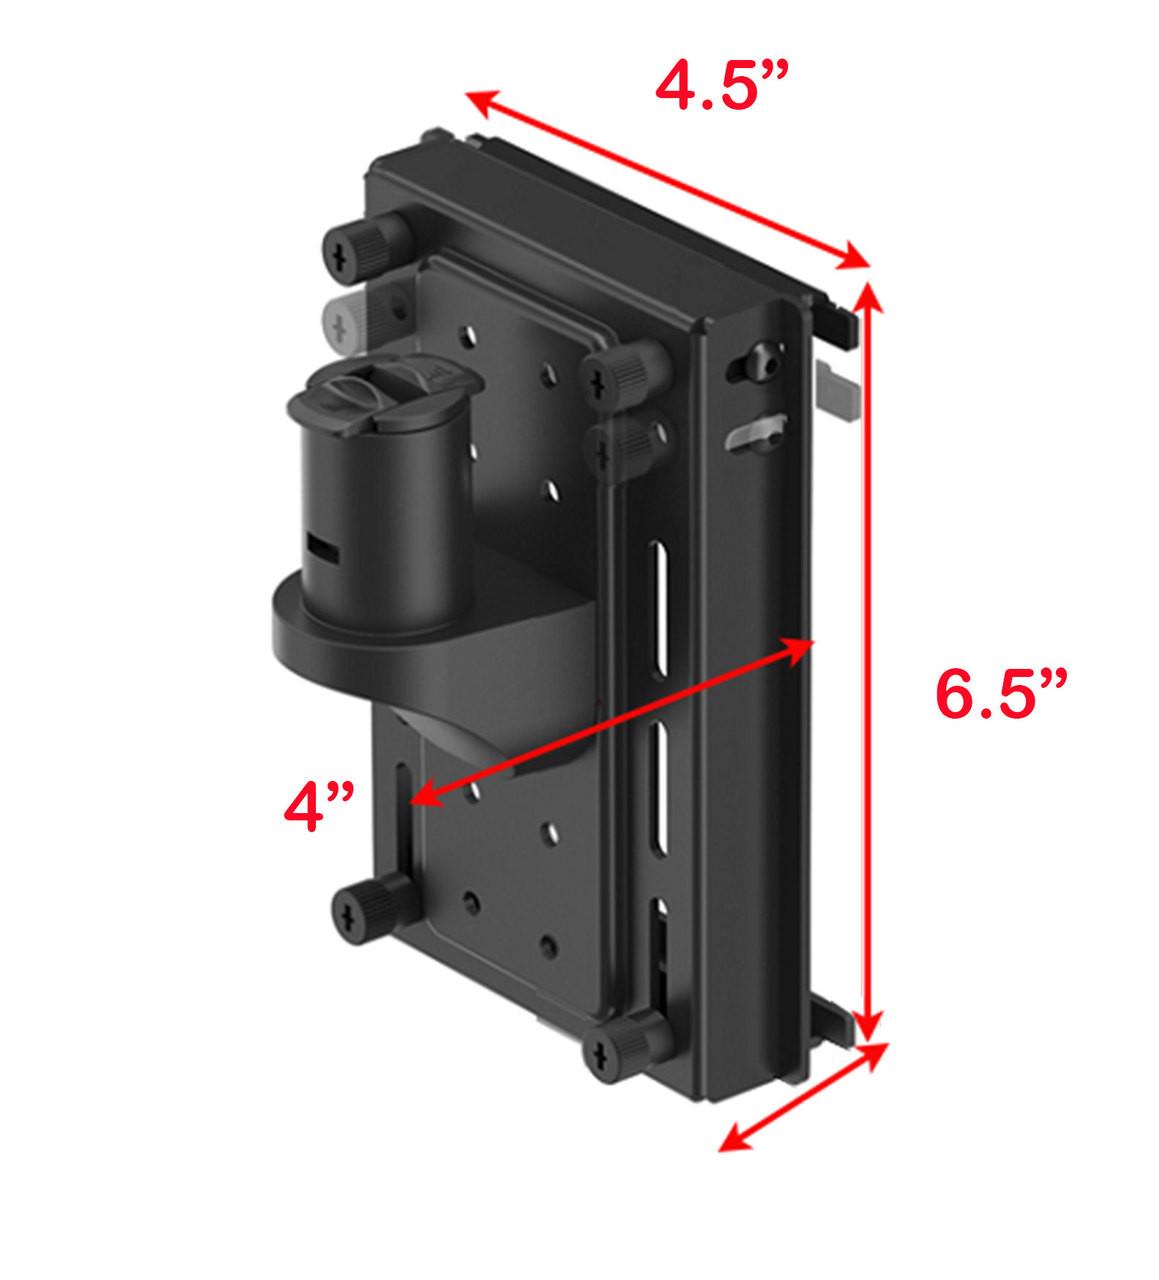 VESA Monitor Mount for Aluminum Organizer Slatwall w/ Short Arm, #OT-SUL-HANG4